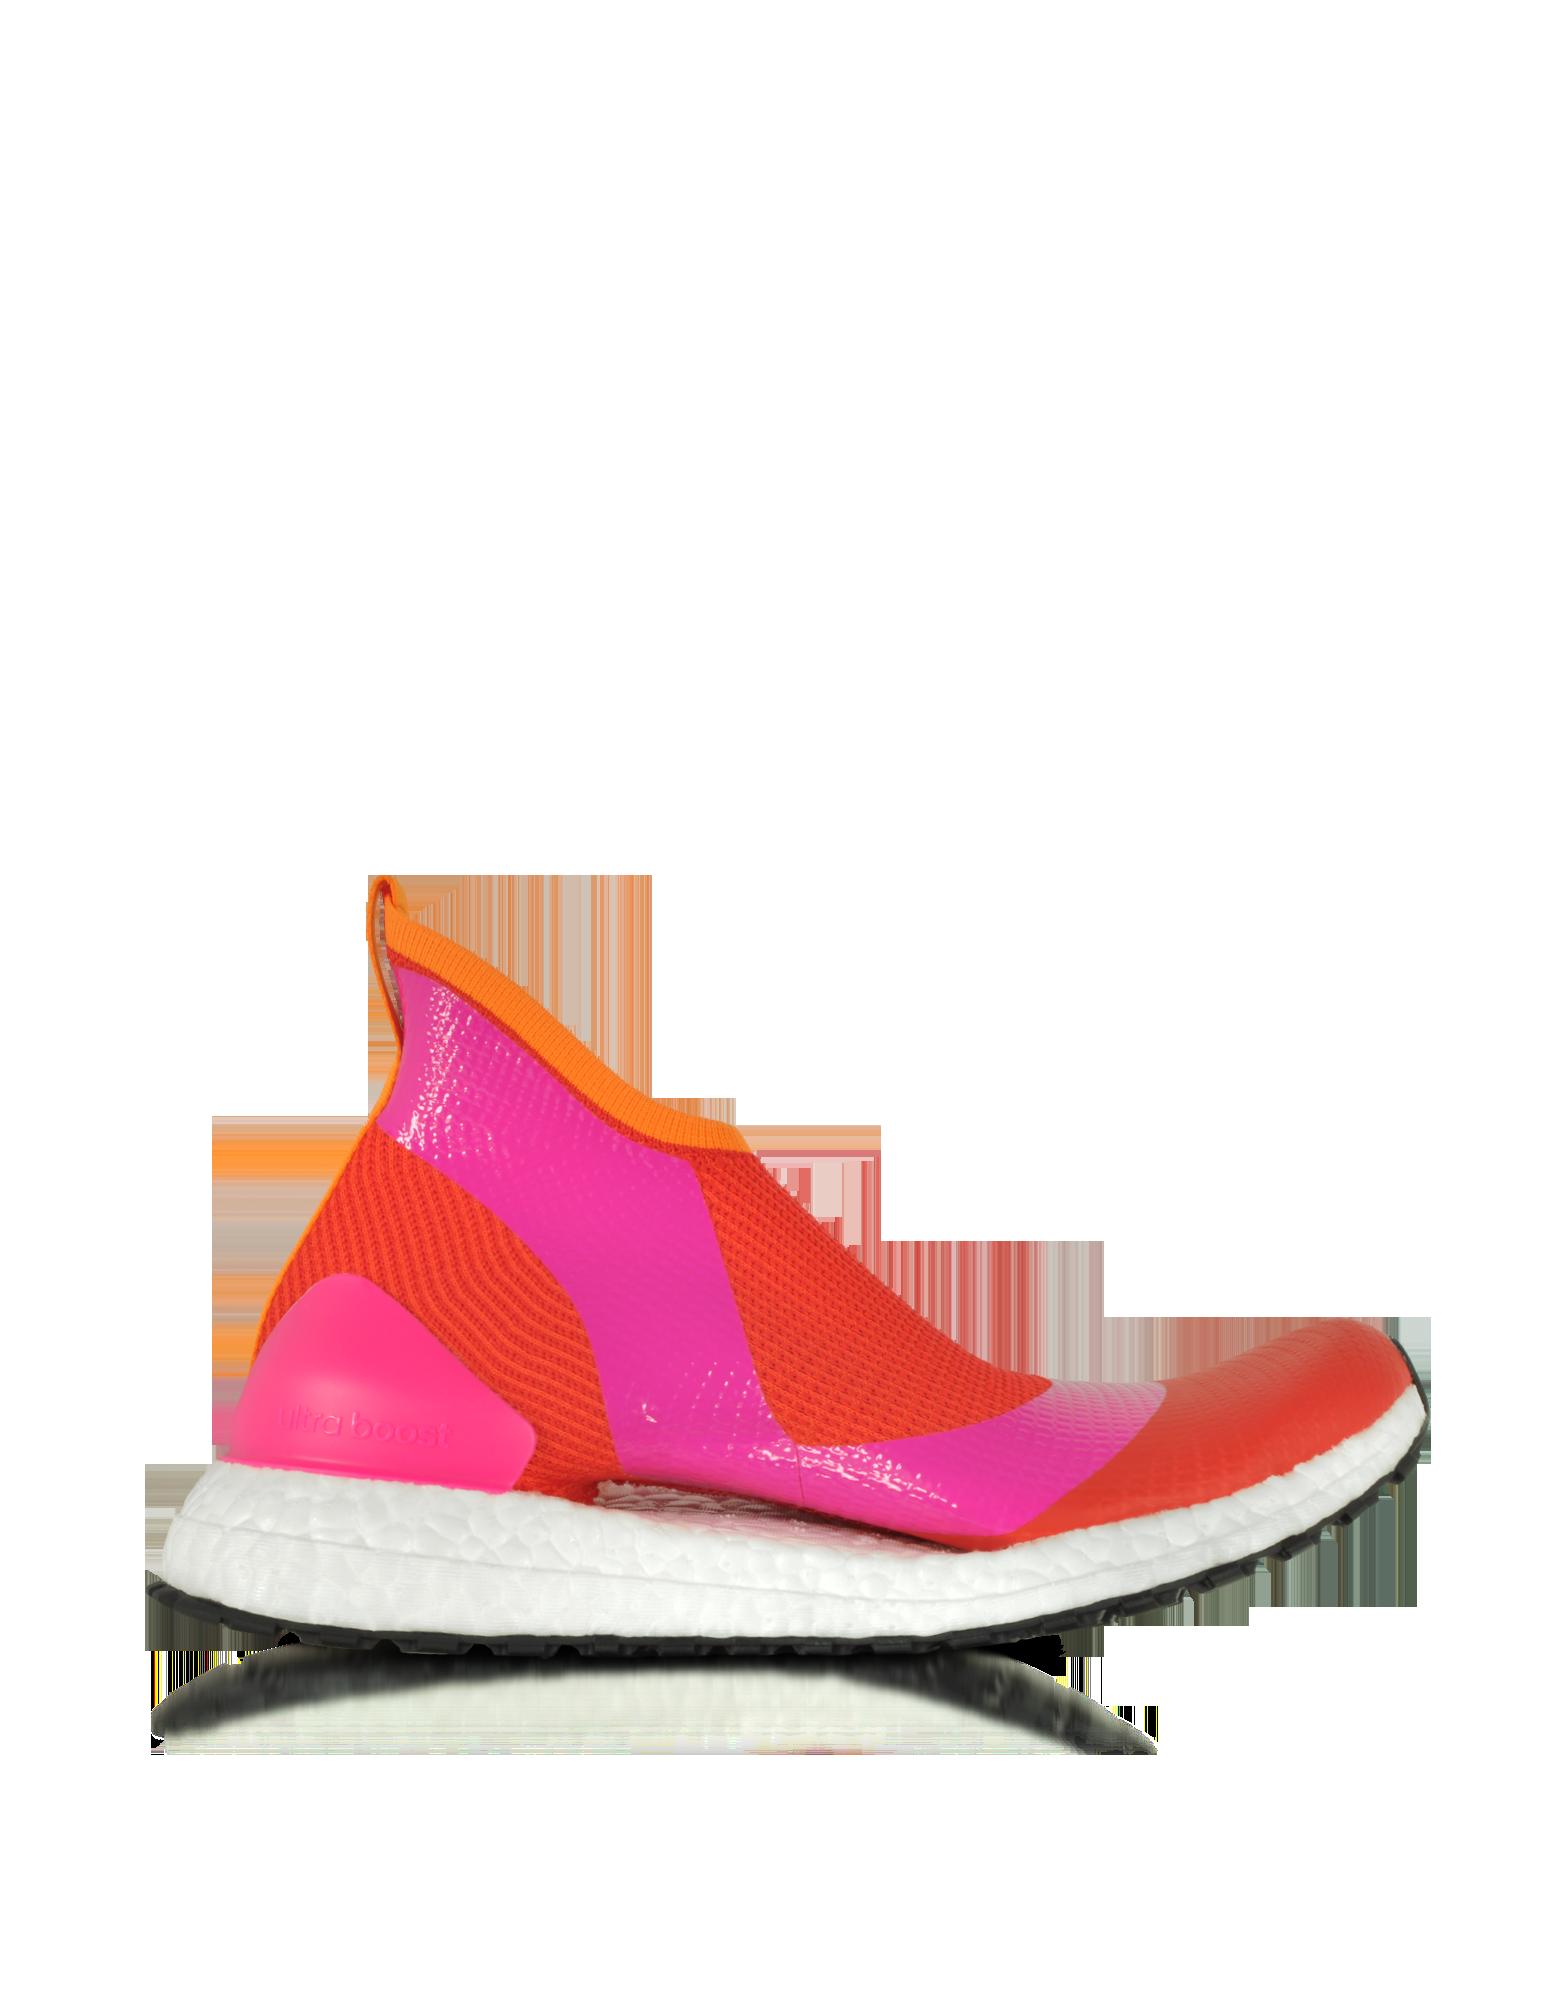 Image of UltraBOOST X ATR44 Shock Pink Women's Sneakers